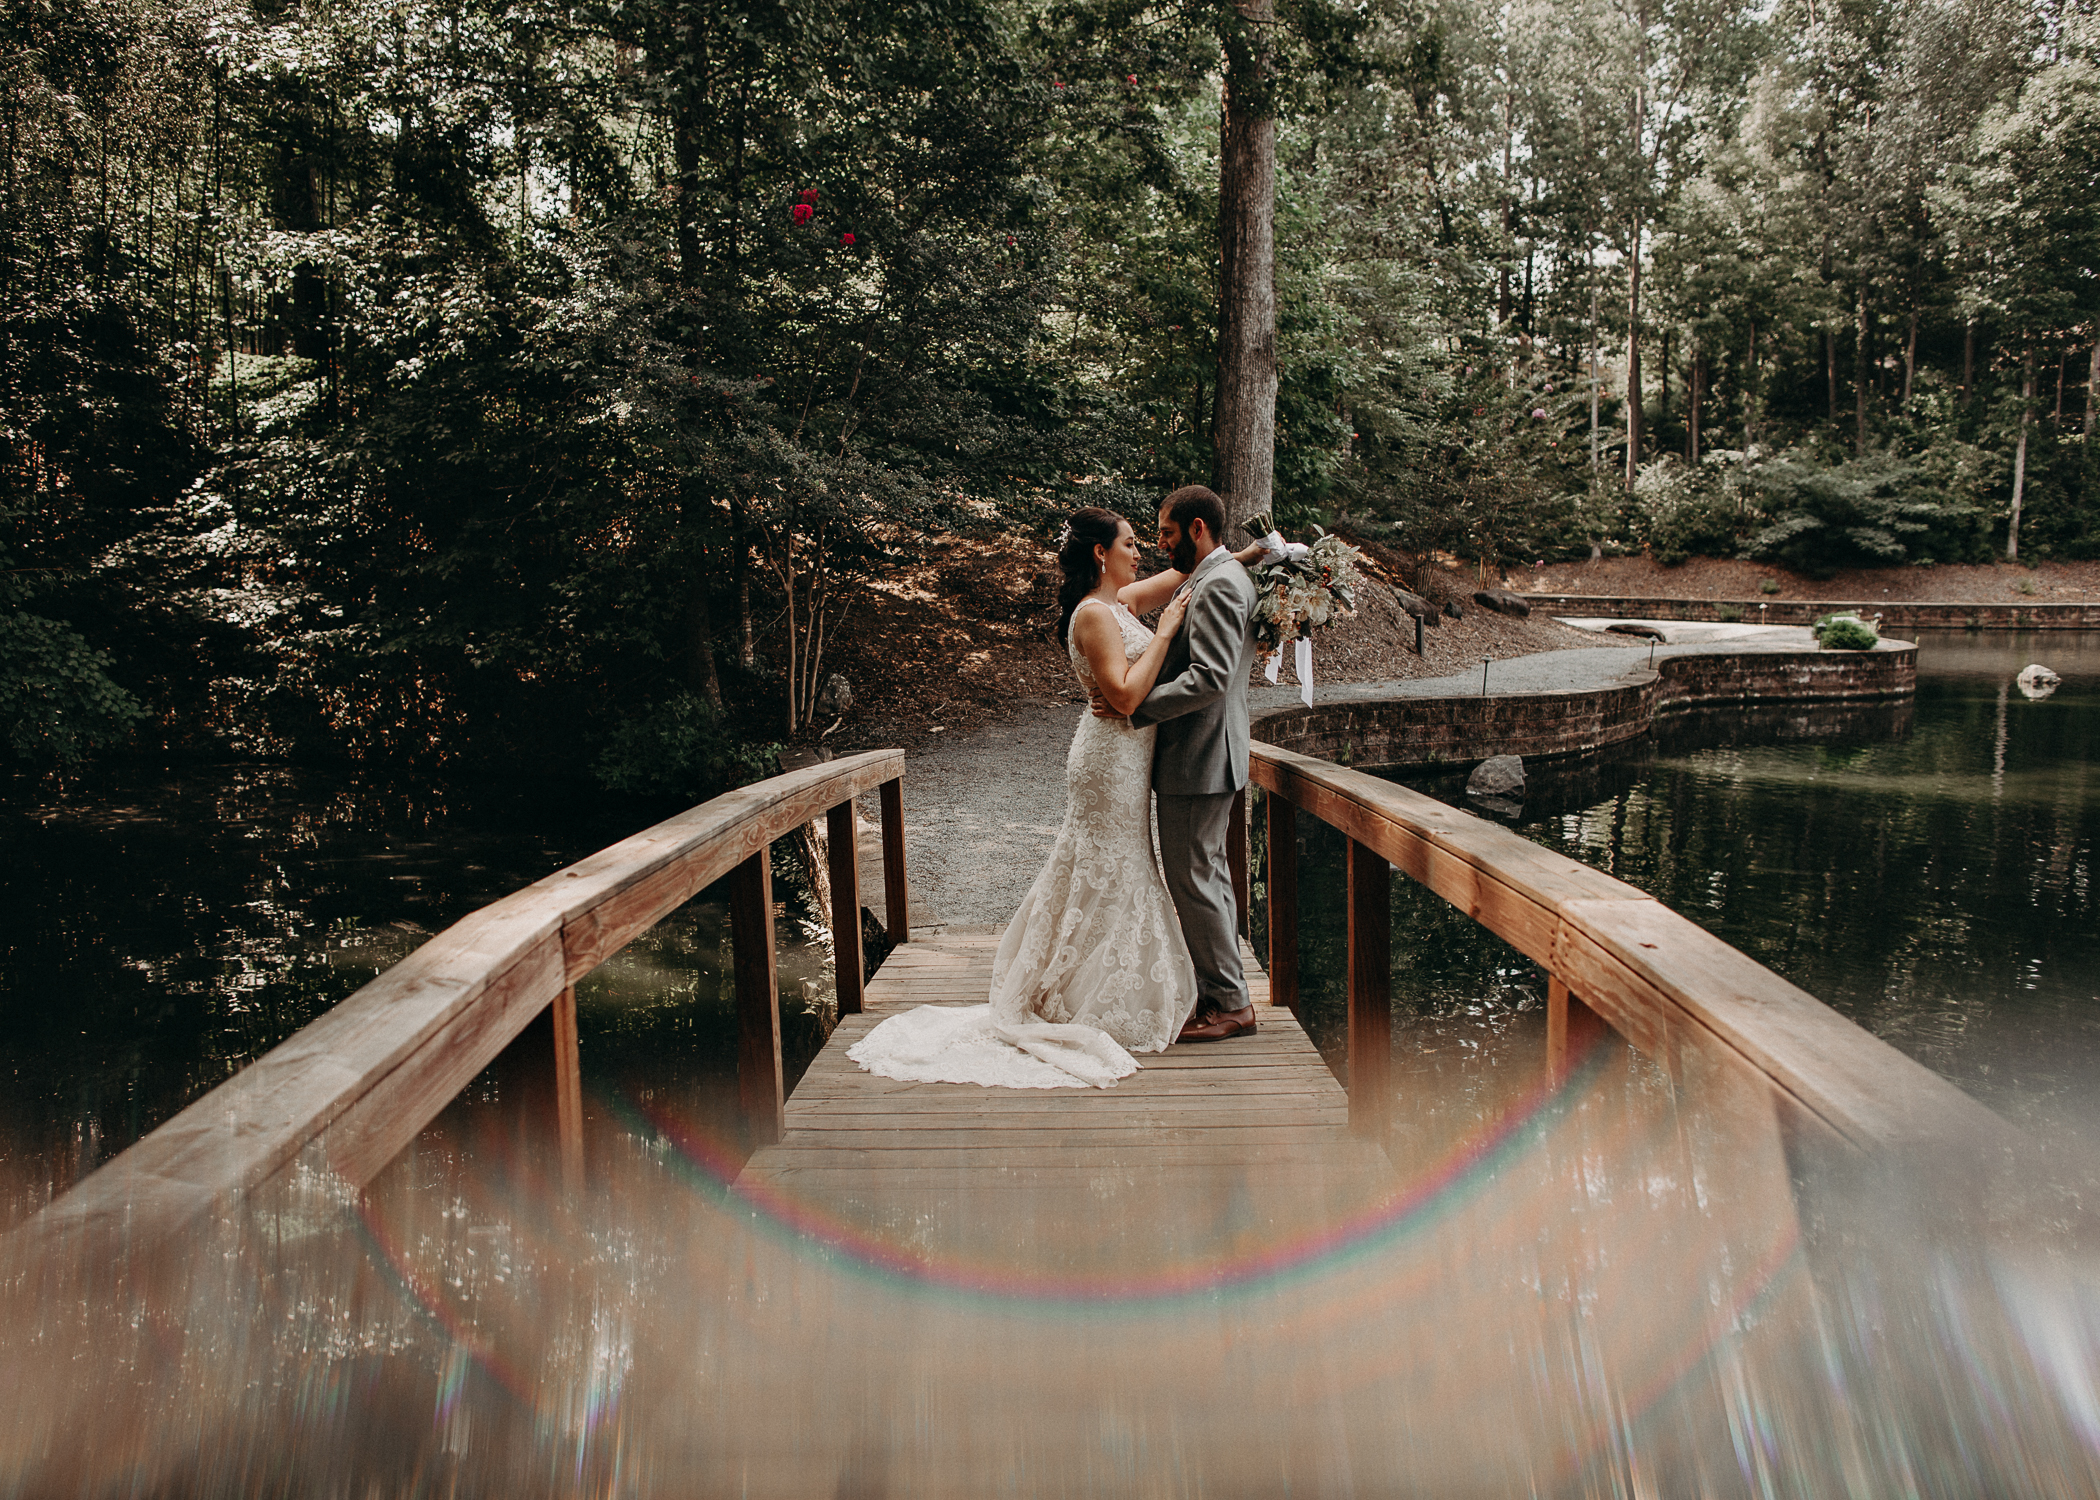 31 wedding day portraits bride and groom atlanta - georgia - ga wedding photographer .jpg